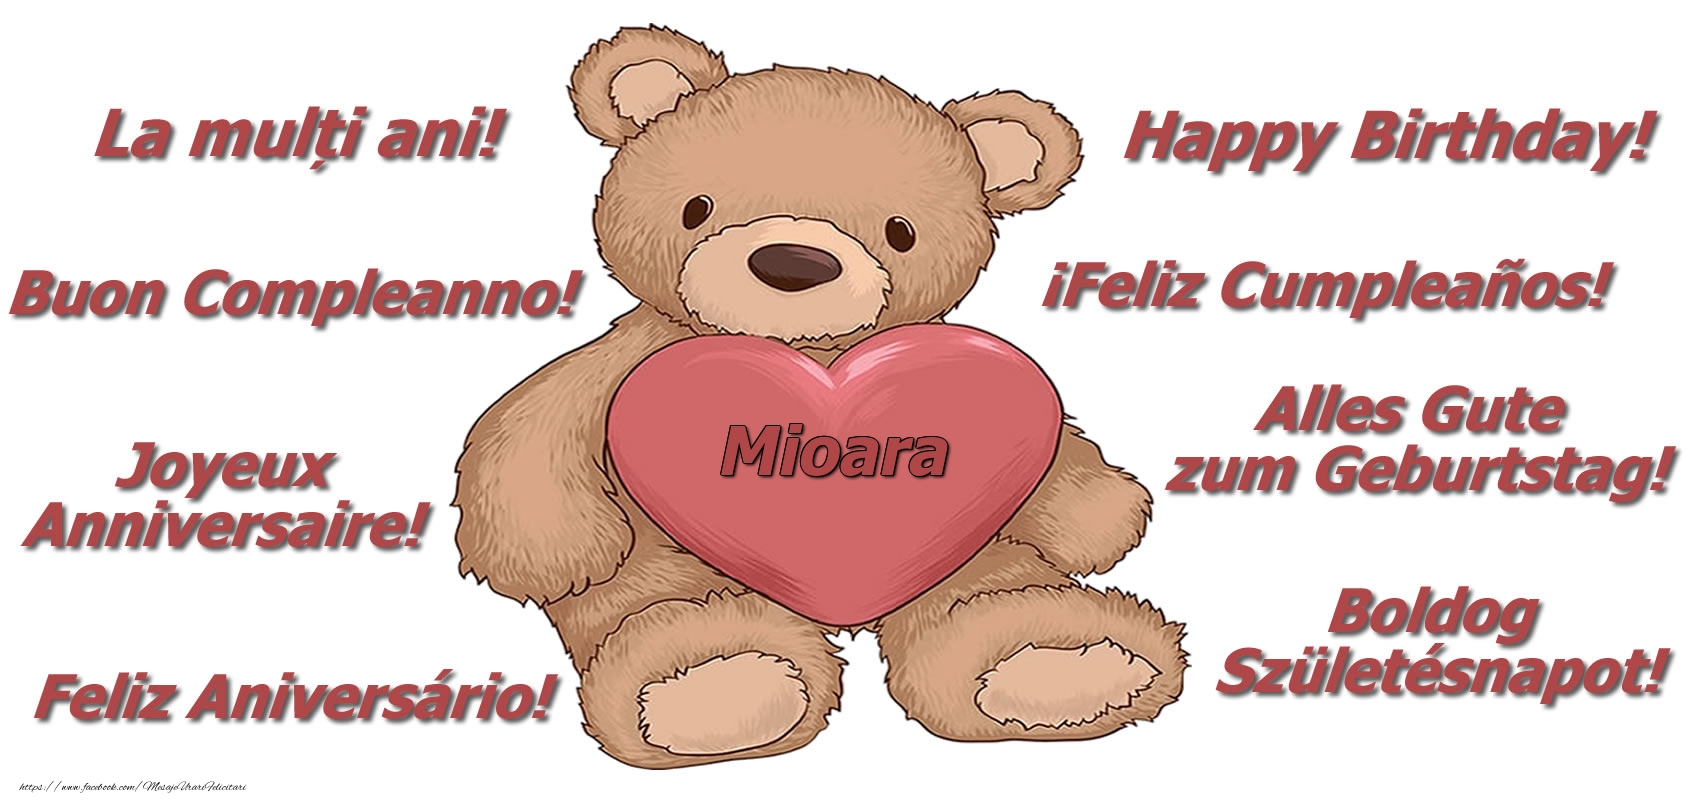 Felicitari de zi de nastere - La multi ani Mioara! - Ursulet